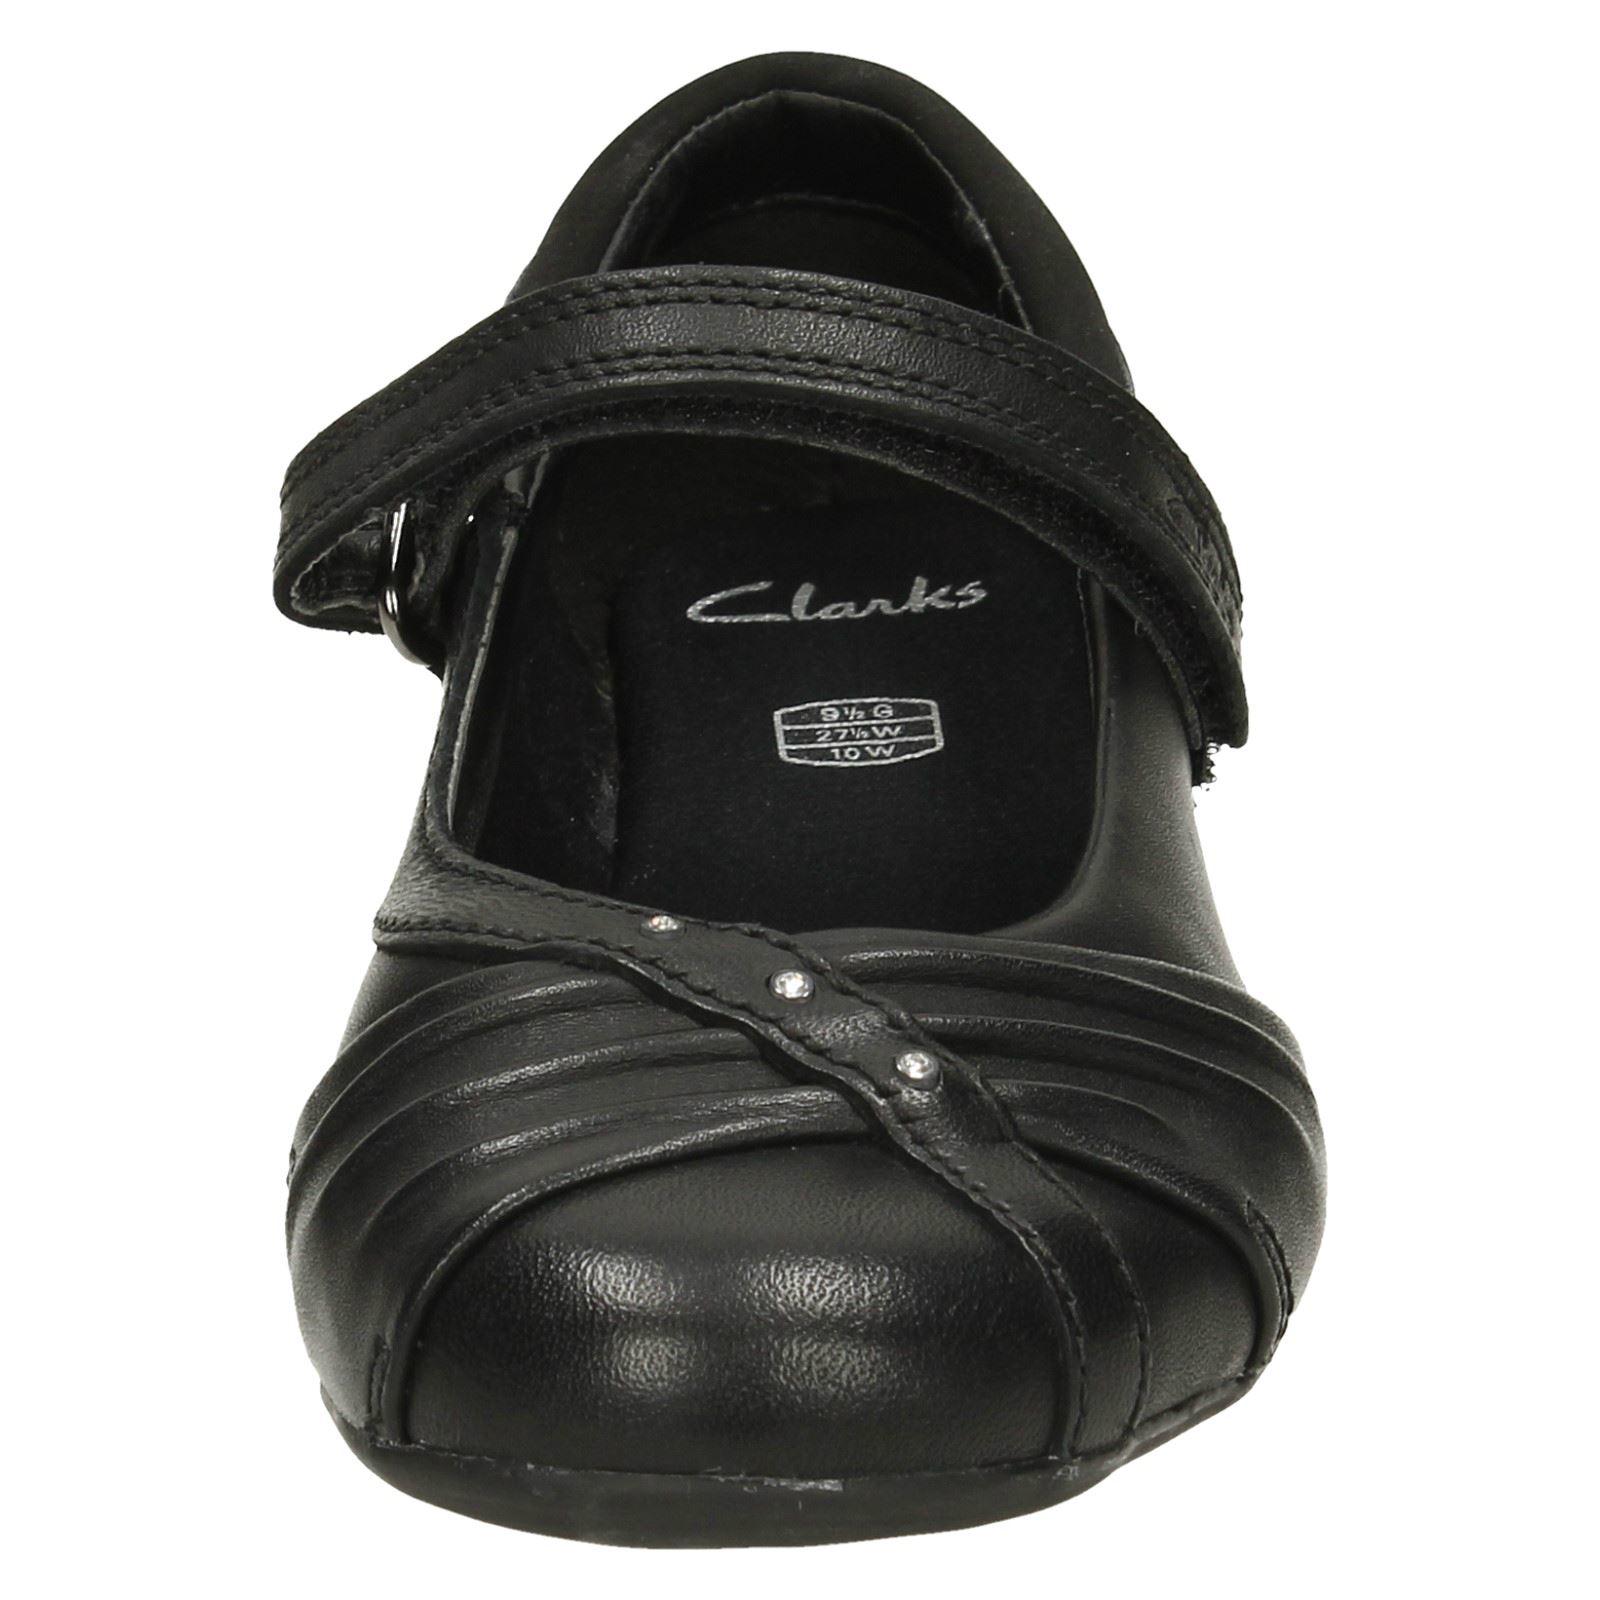 Girls Clarks Ballerina Style School Shoes Dolly Shy